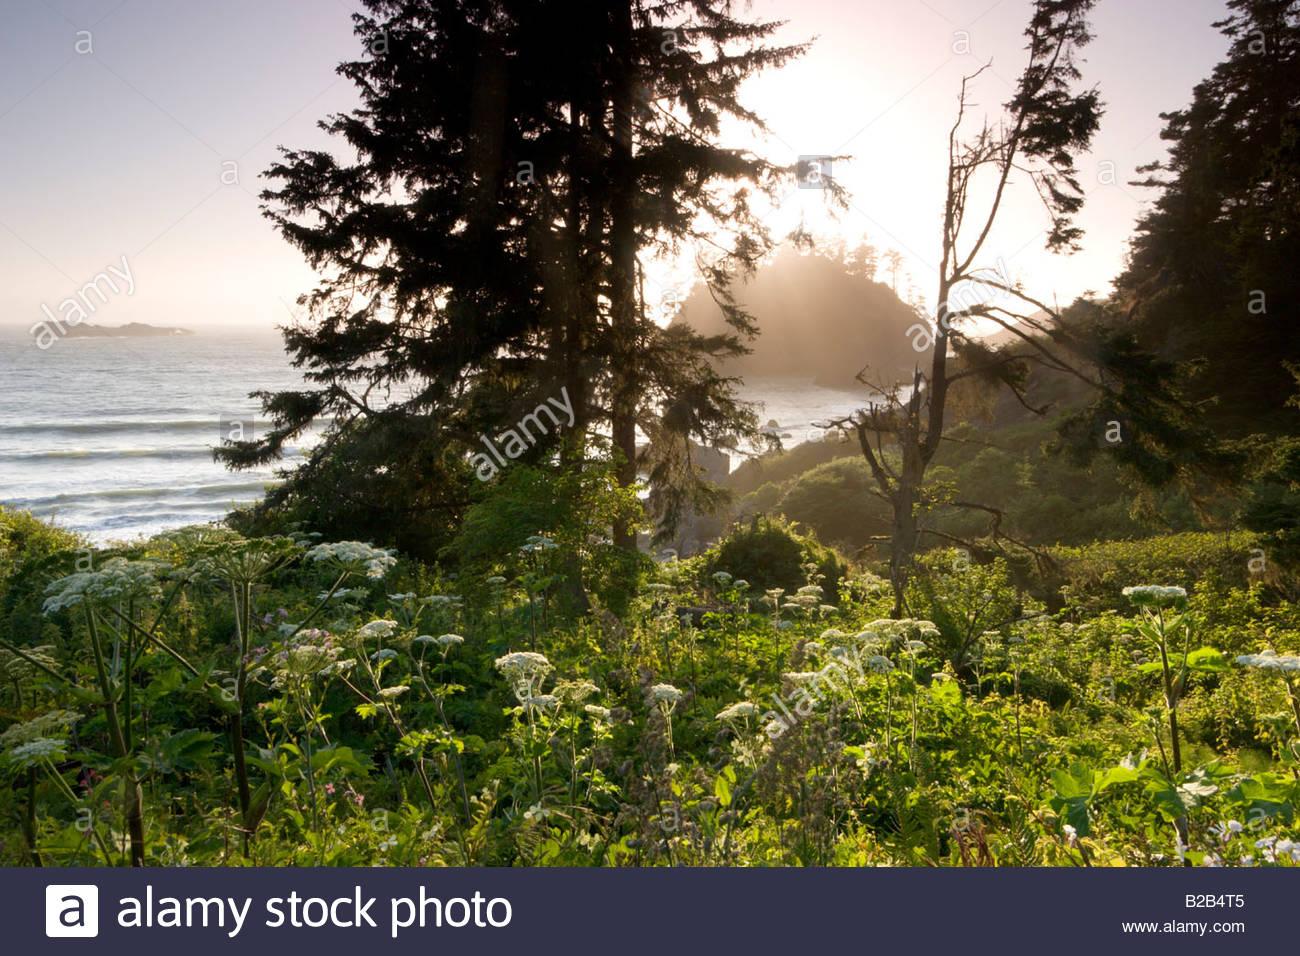 Cow Parsnip Heracleum maximum Trinidad State Beach California - Stock Image